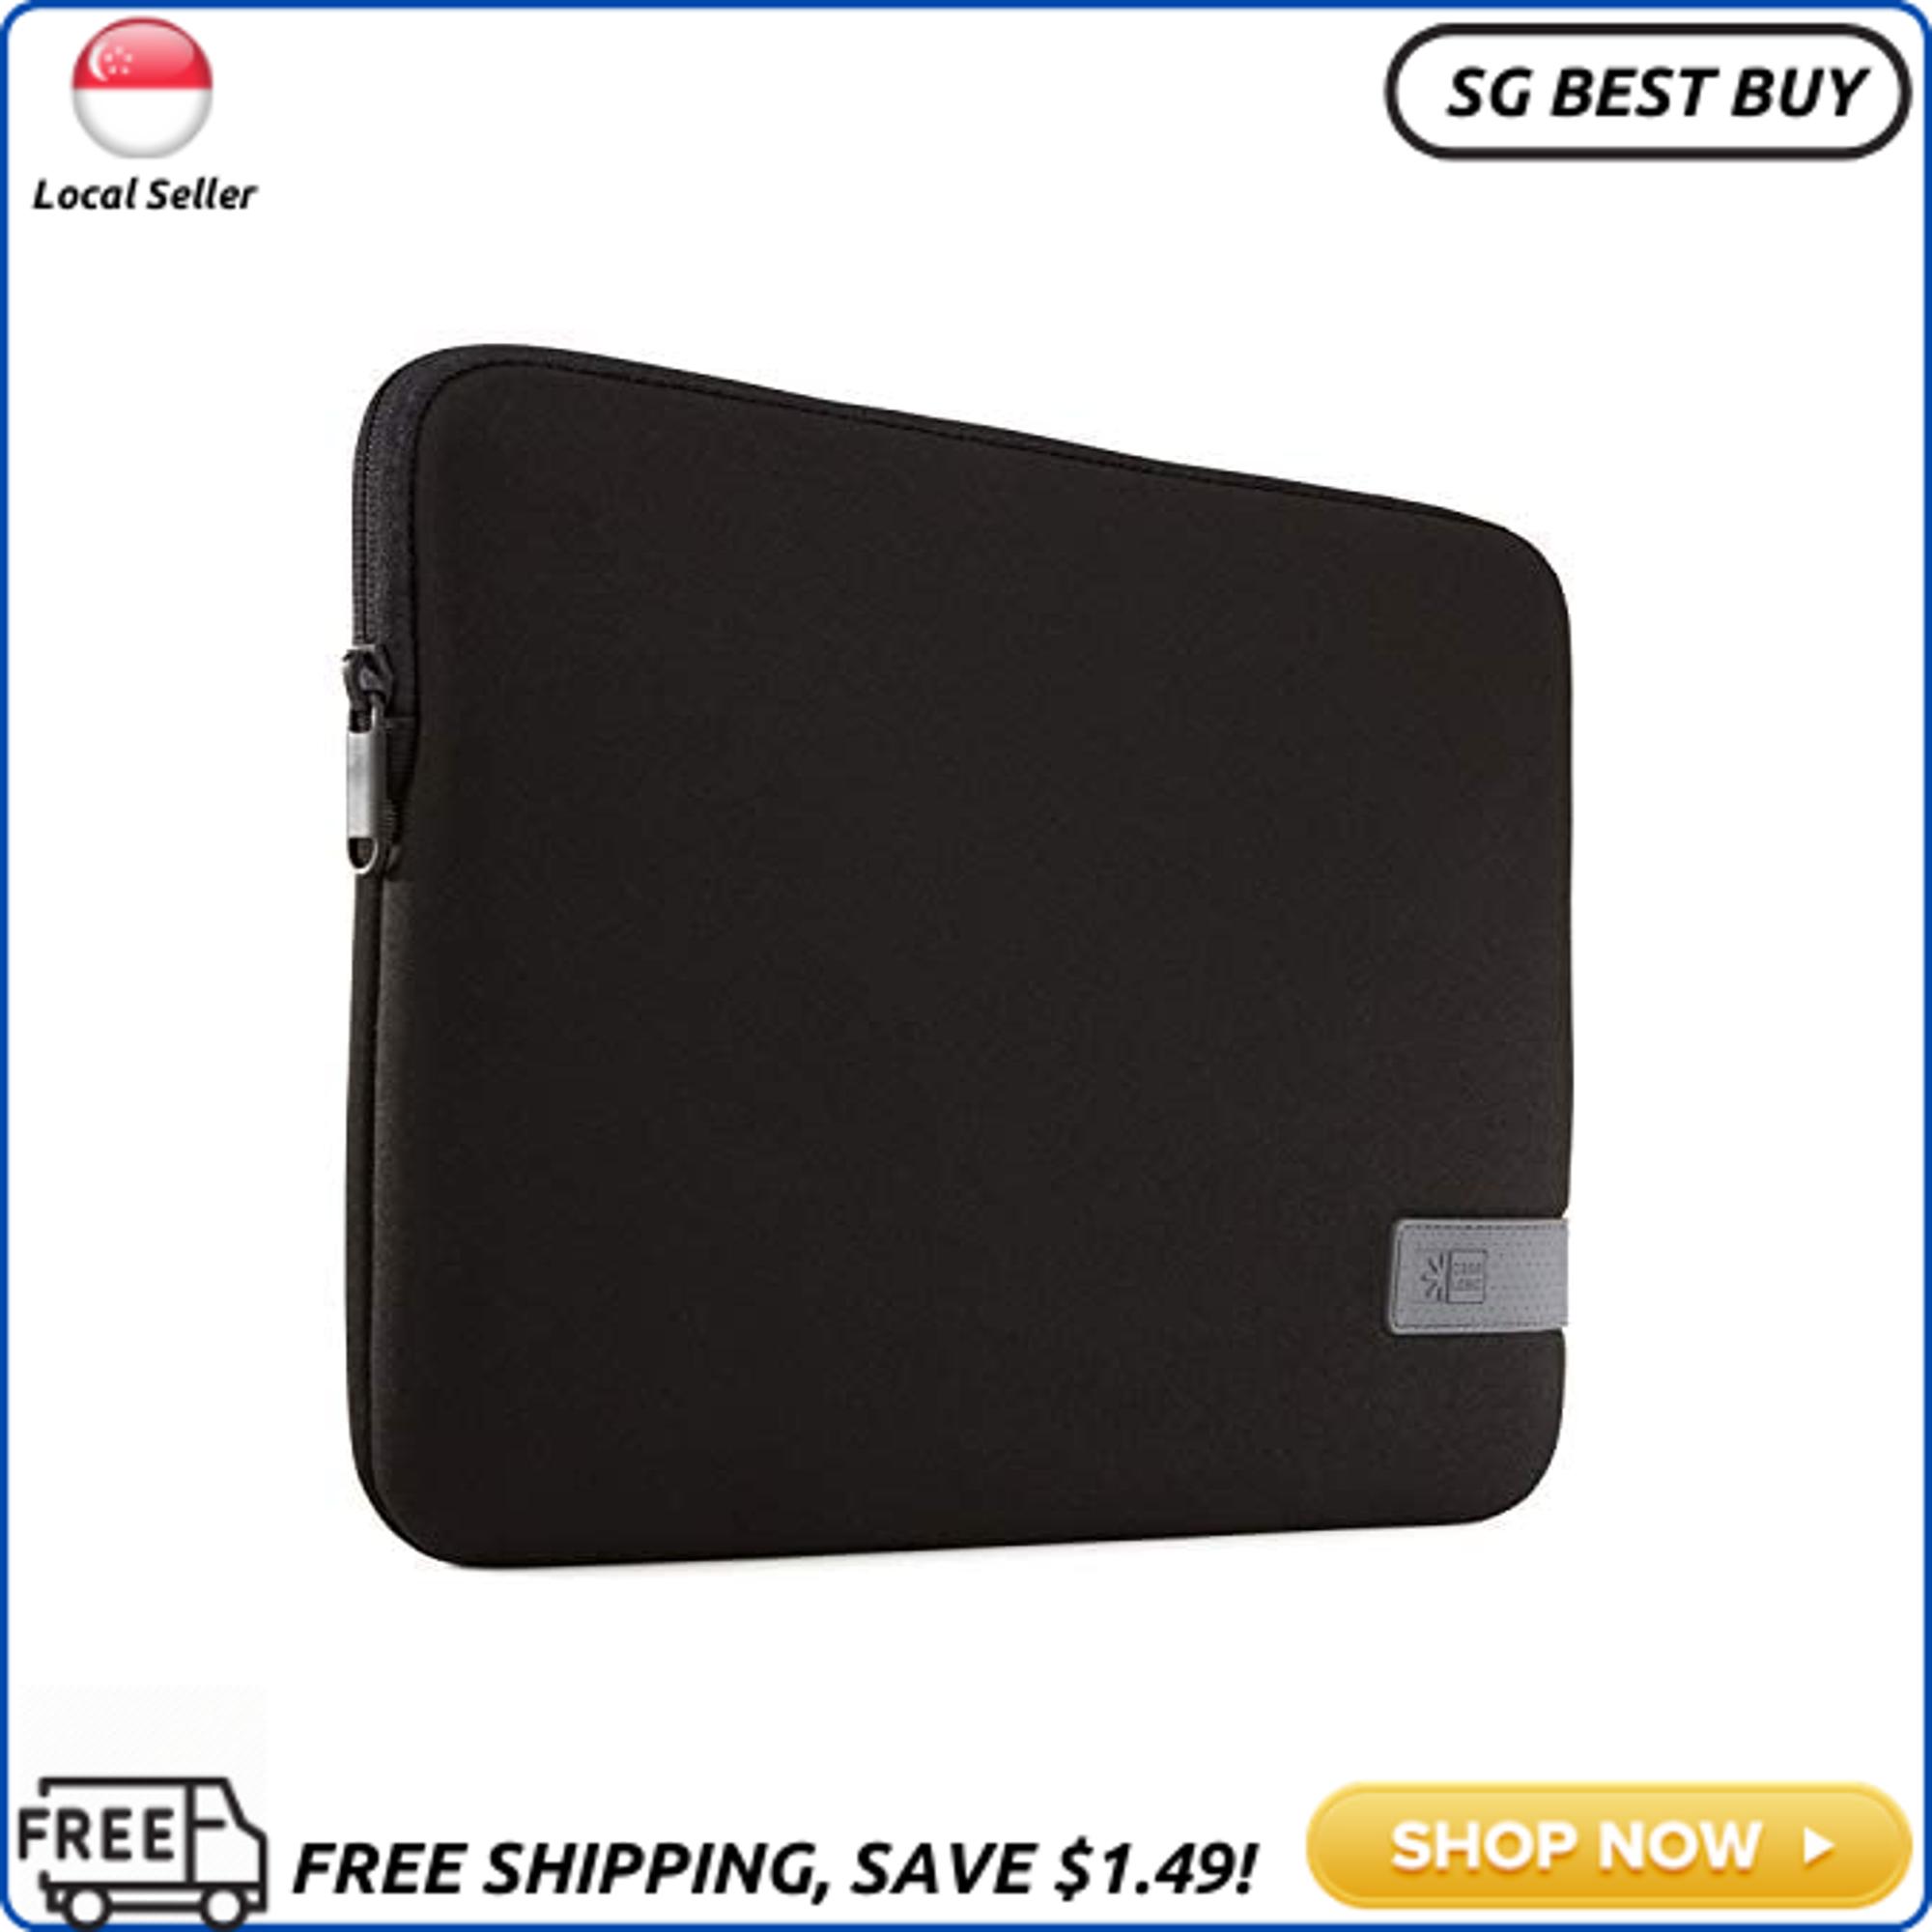 (SG SELLER) Case Logic Reflect 13 MacBook Pro Sleeve-Dark Blue, Black